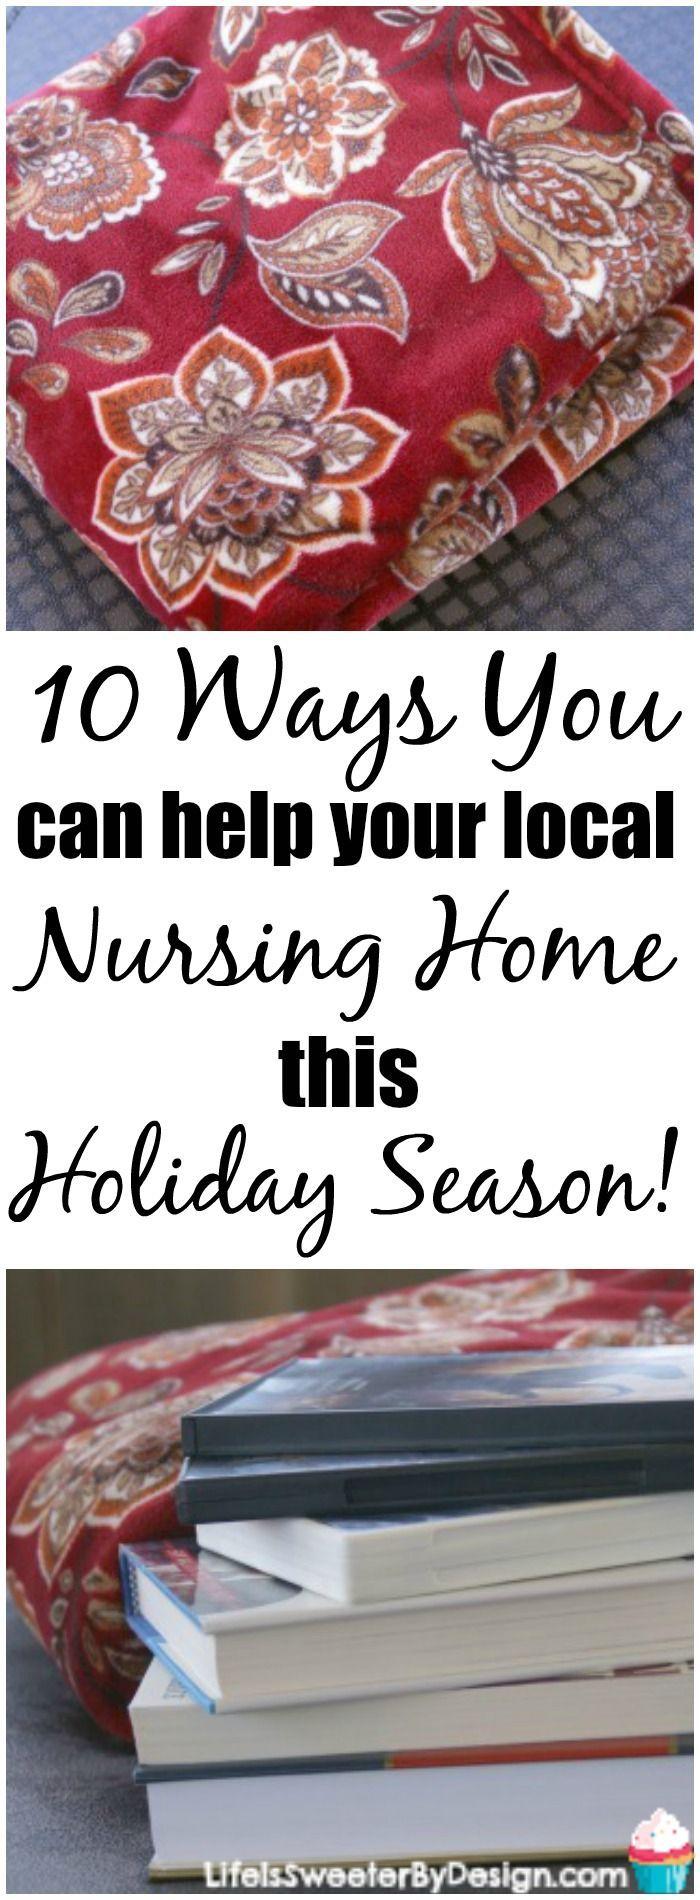 Nursing home christmas gift ideas